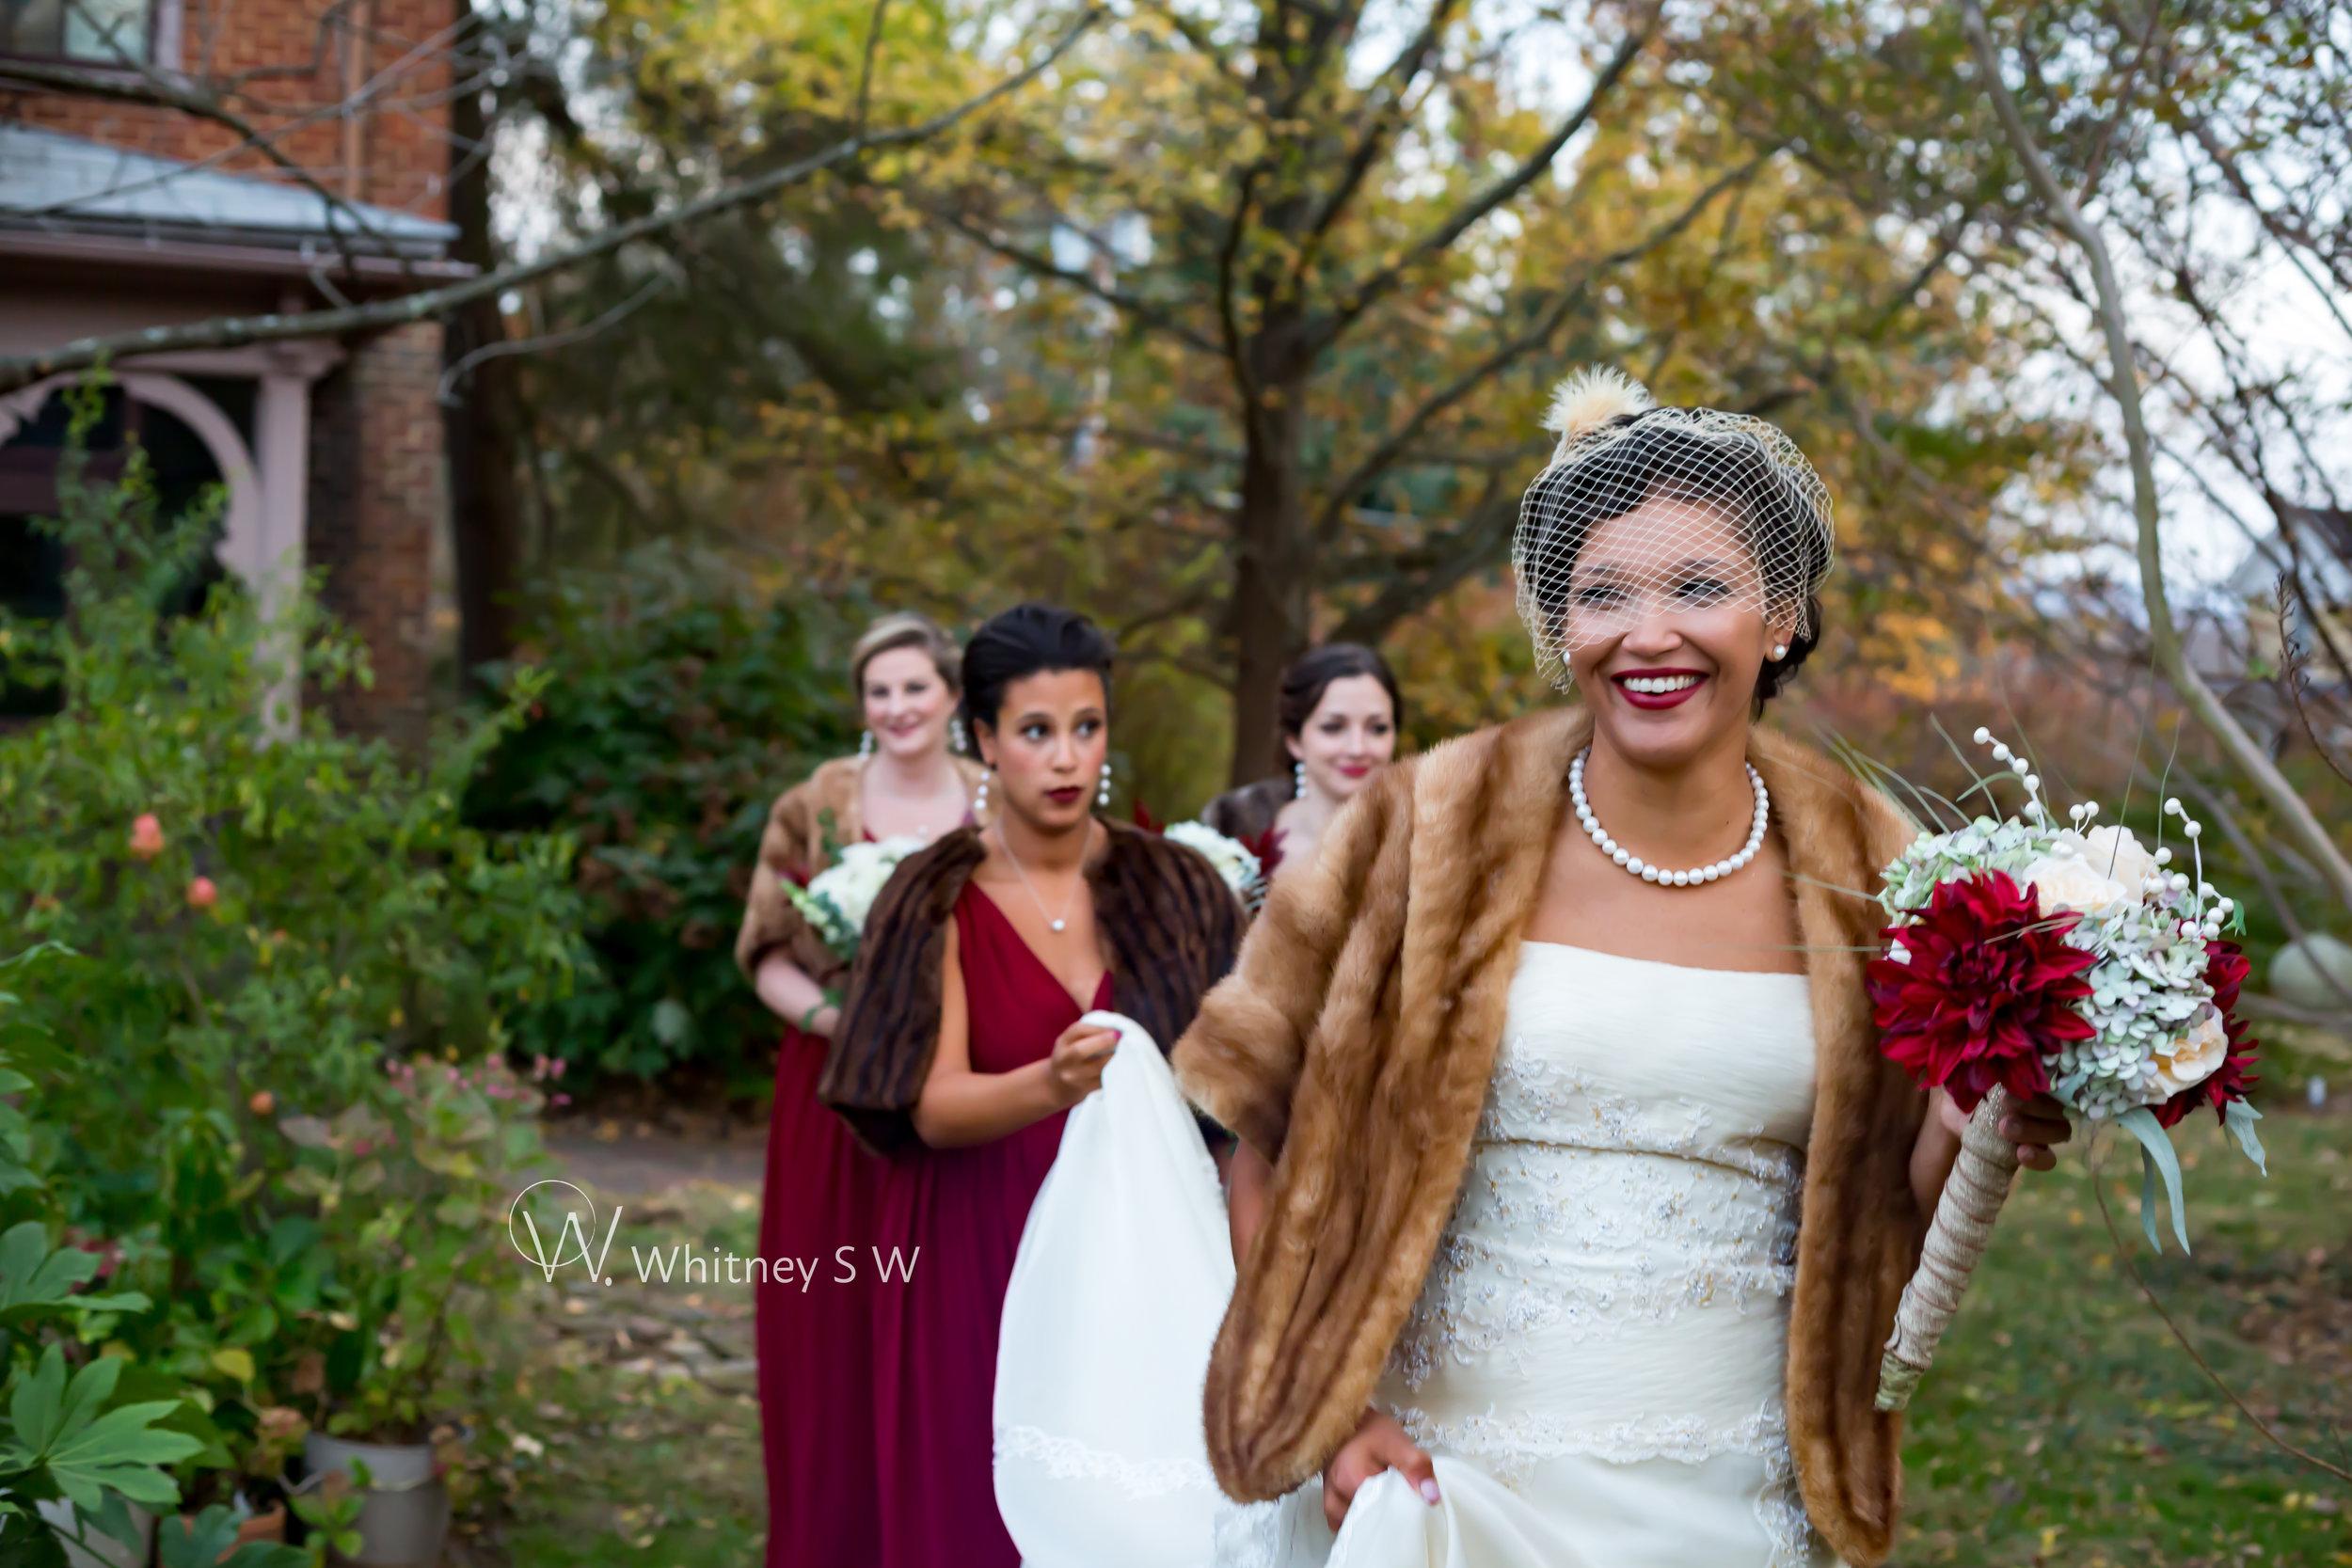 Photo by Whitney S Williams_Wedding of Katelyn and Blake_02_wtk.jpg